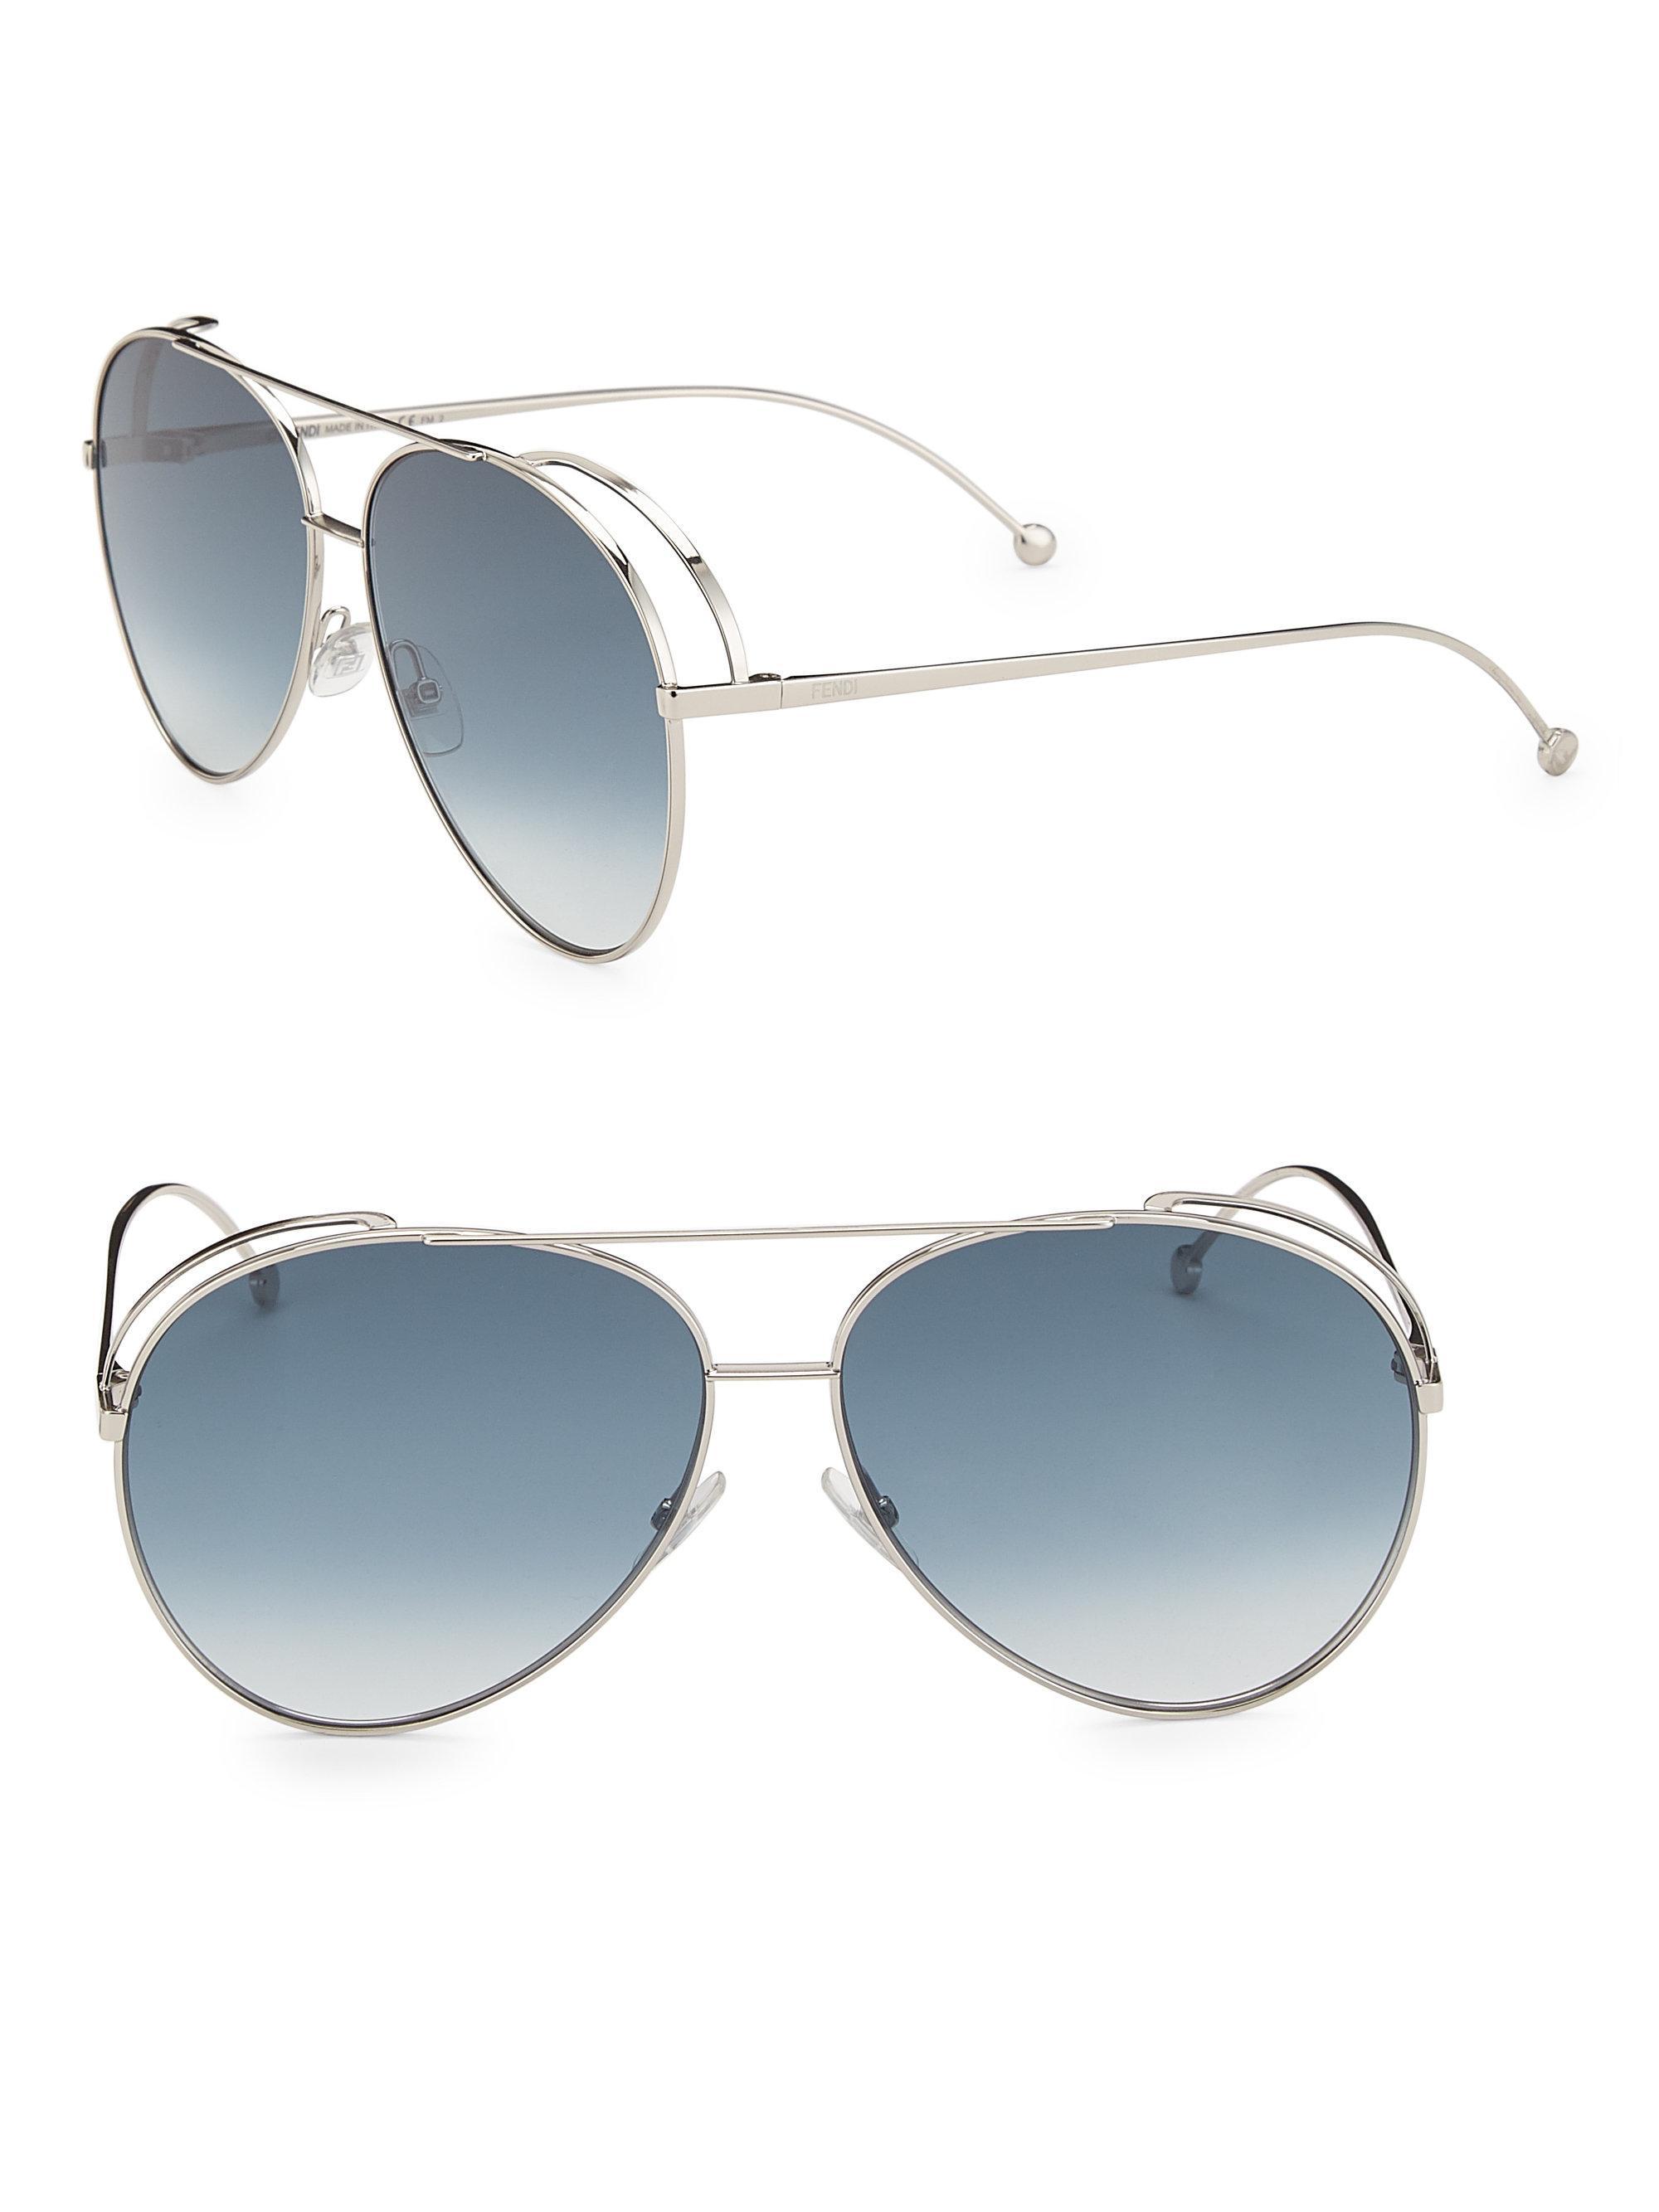 b36b8d52493 Fendi 63mm Classic Aviator Sunglasses in Blue - Lyst